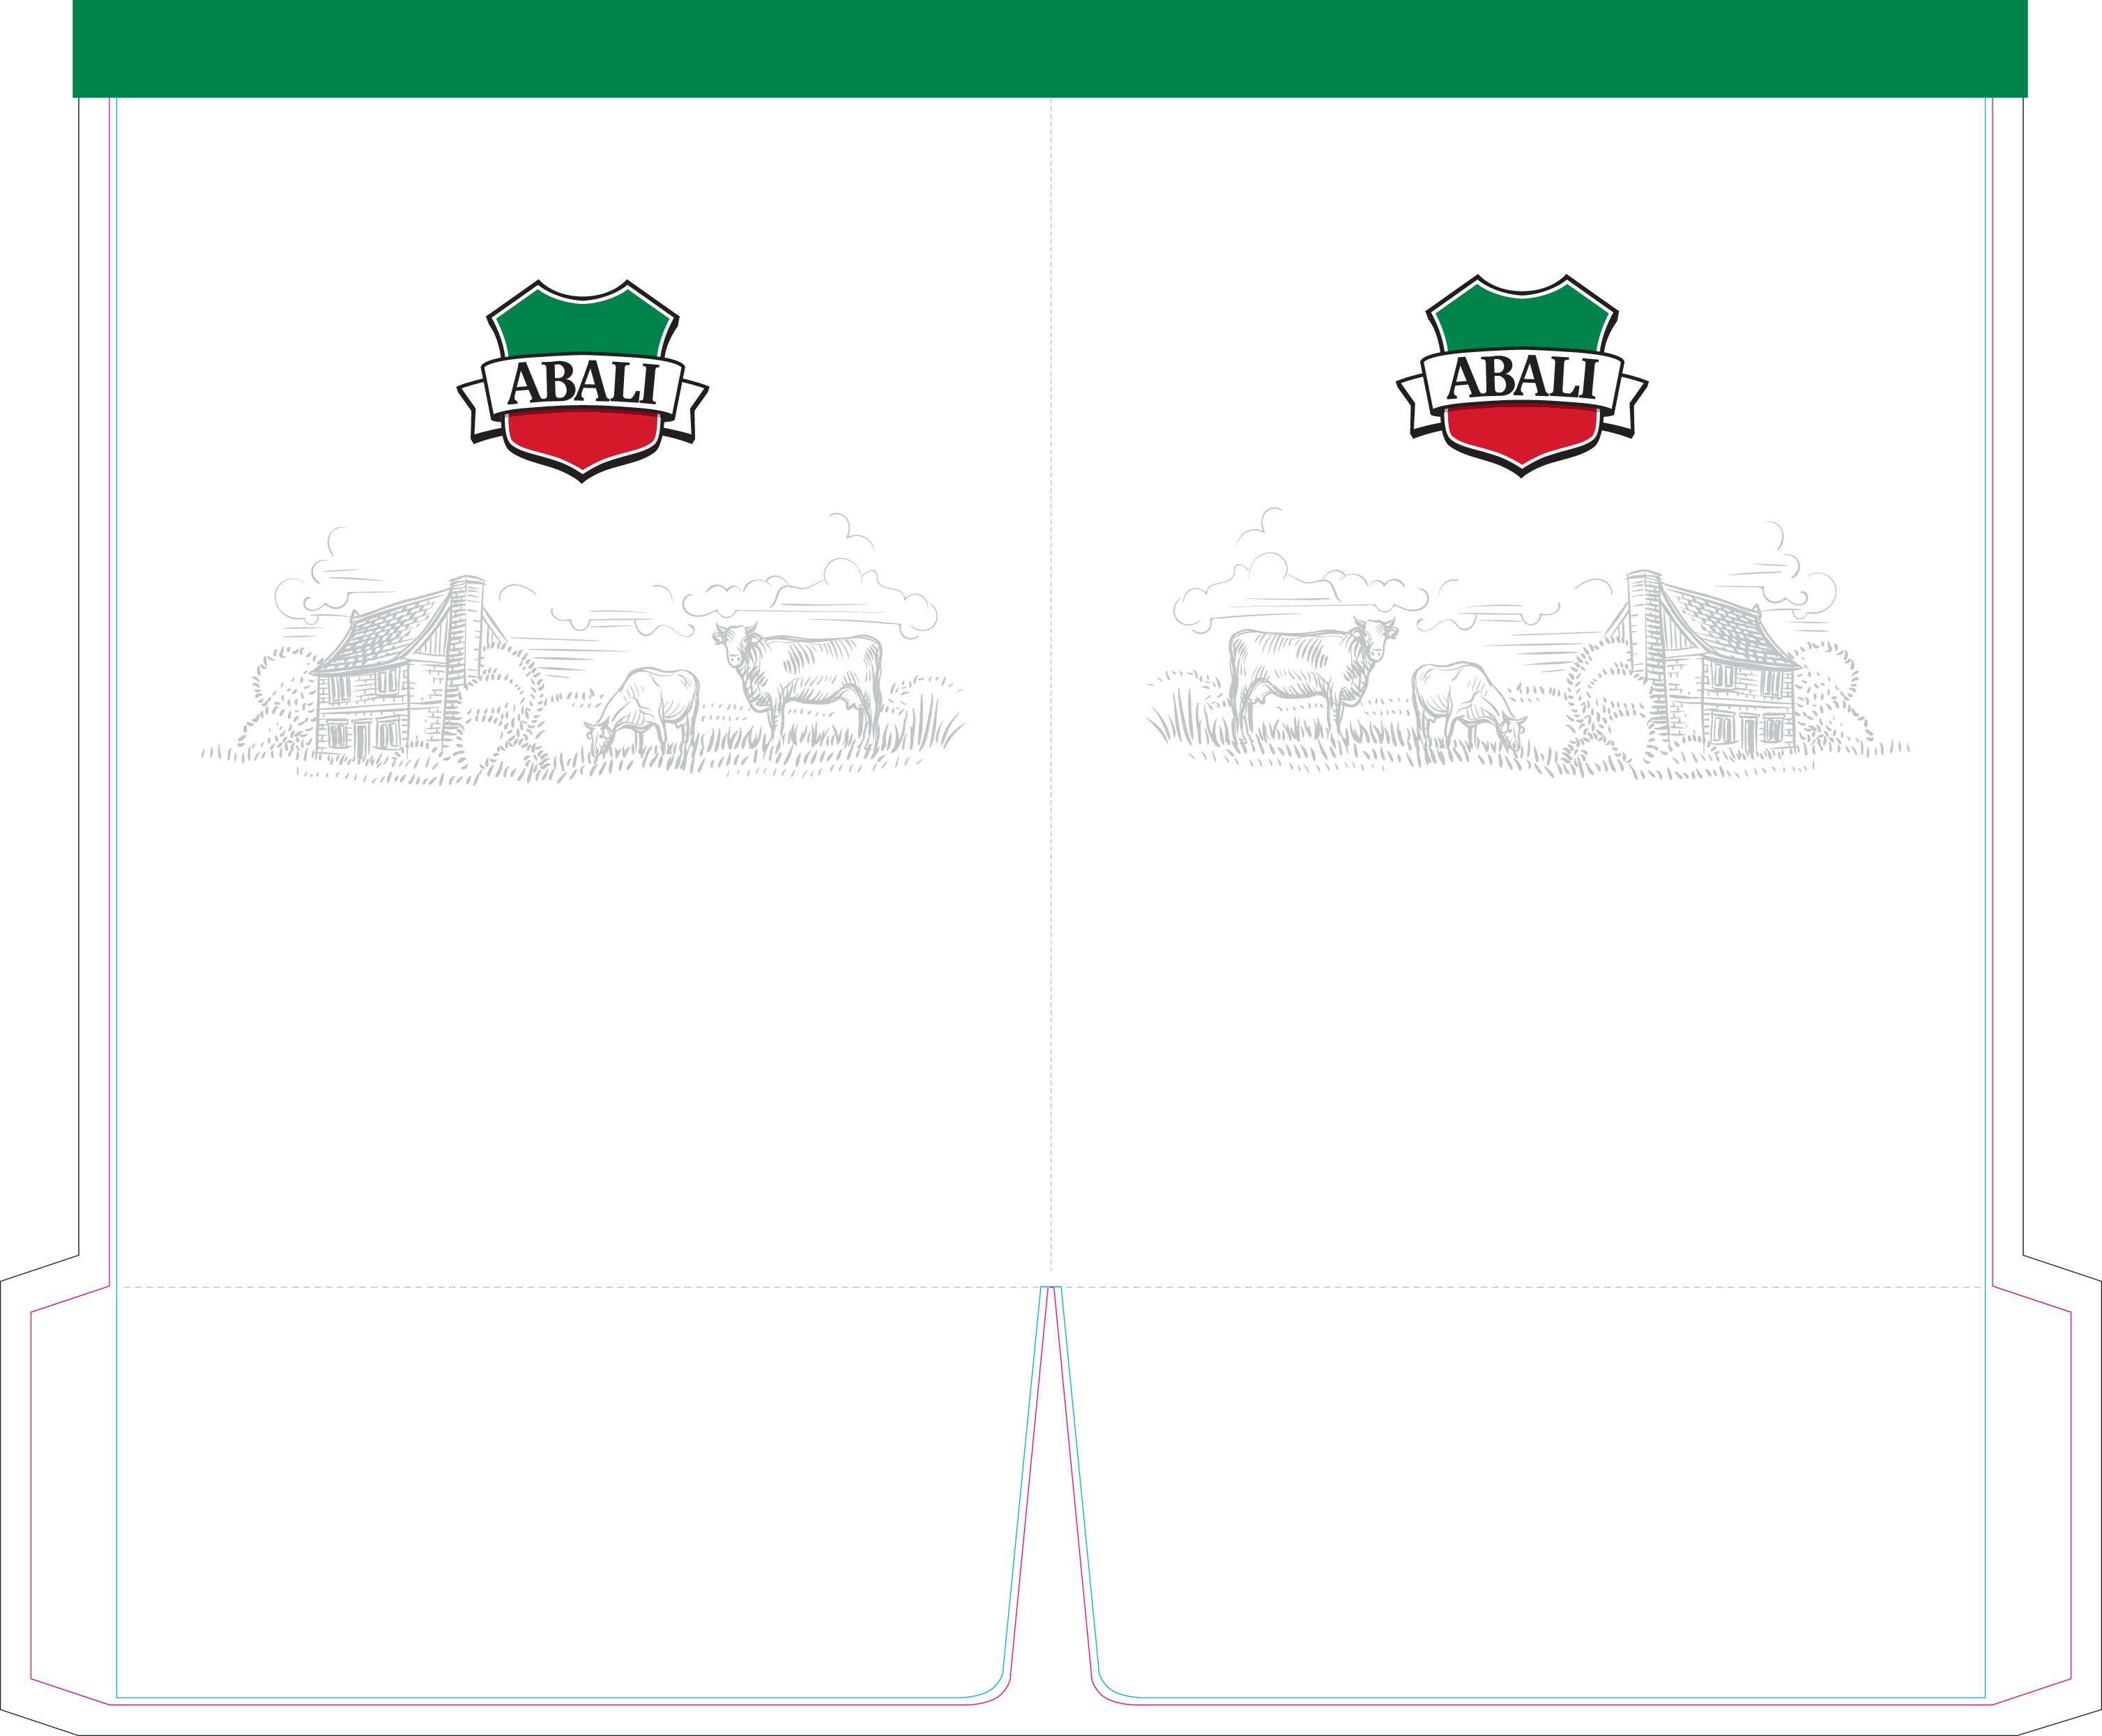 Design a Clean Sell Sheet & Presentation Folder for Abali Yogurt